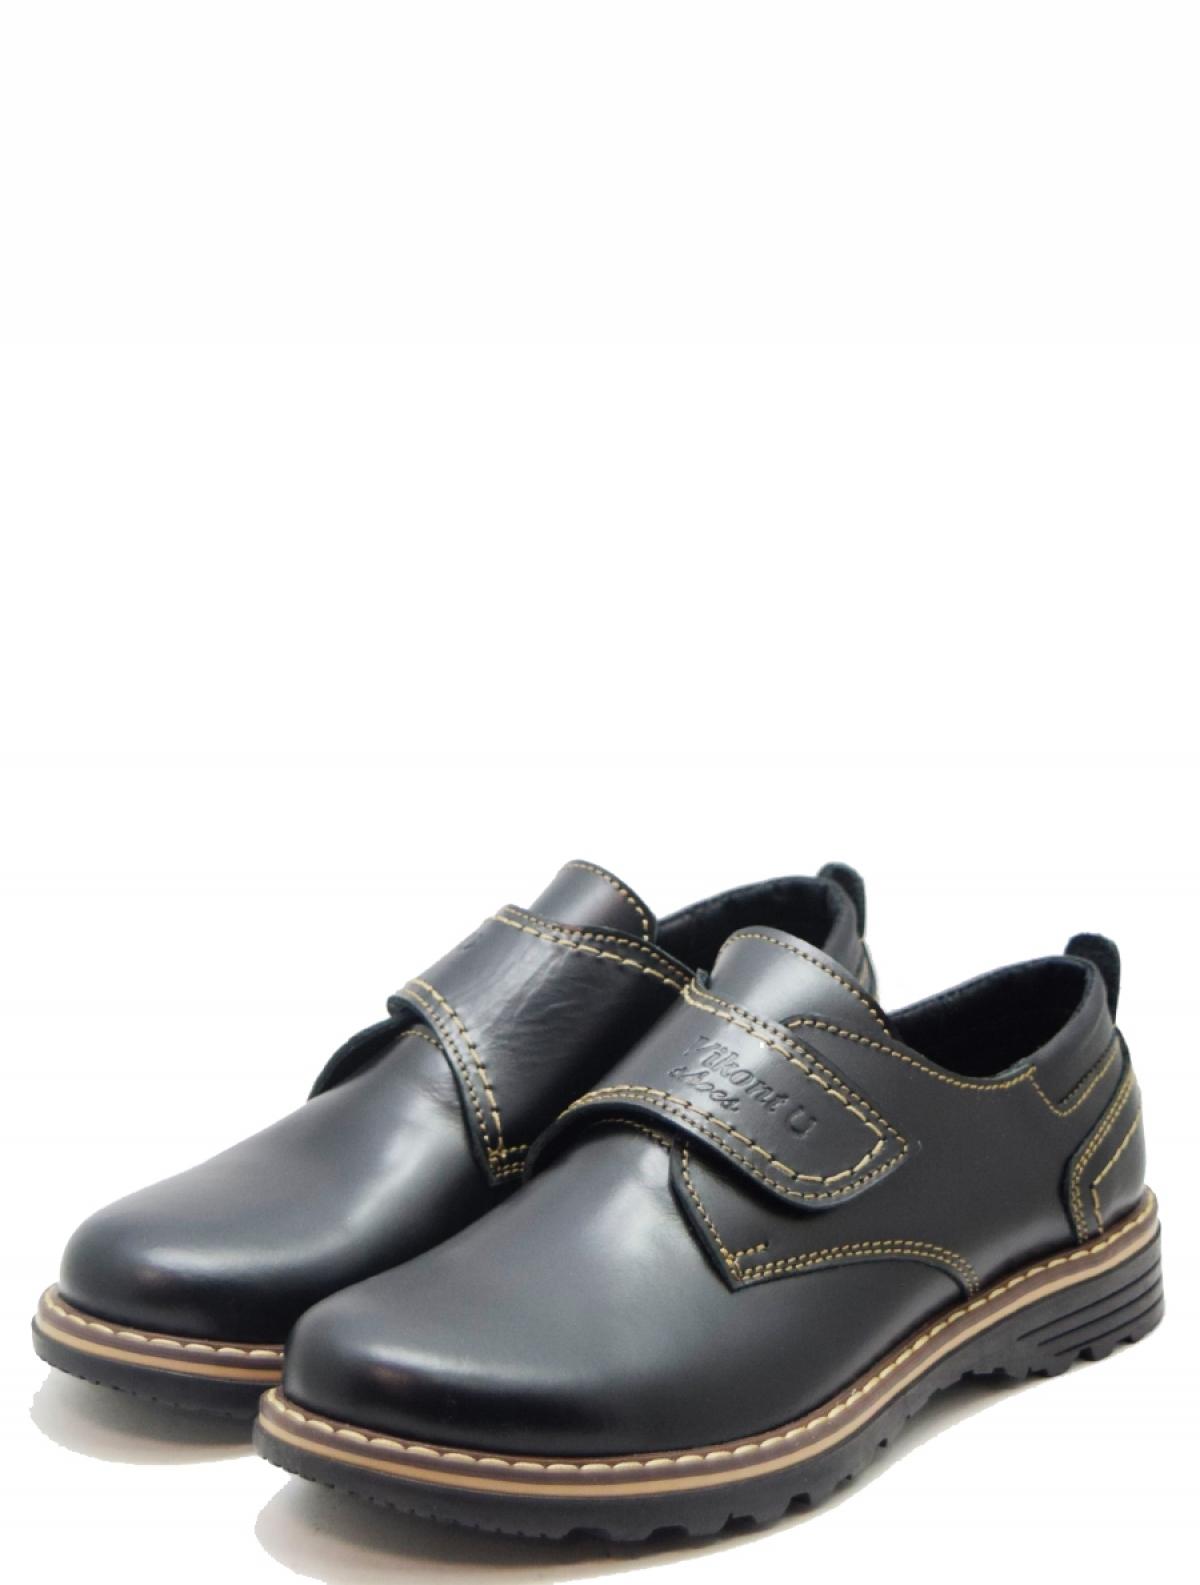 Vikont 704-1/1 детские туфли